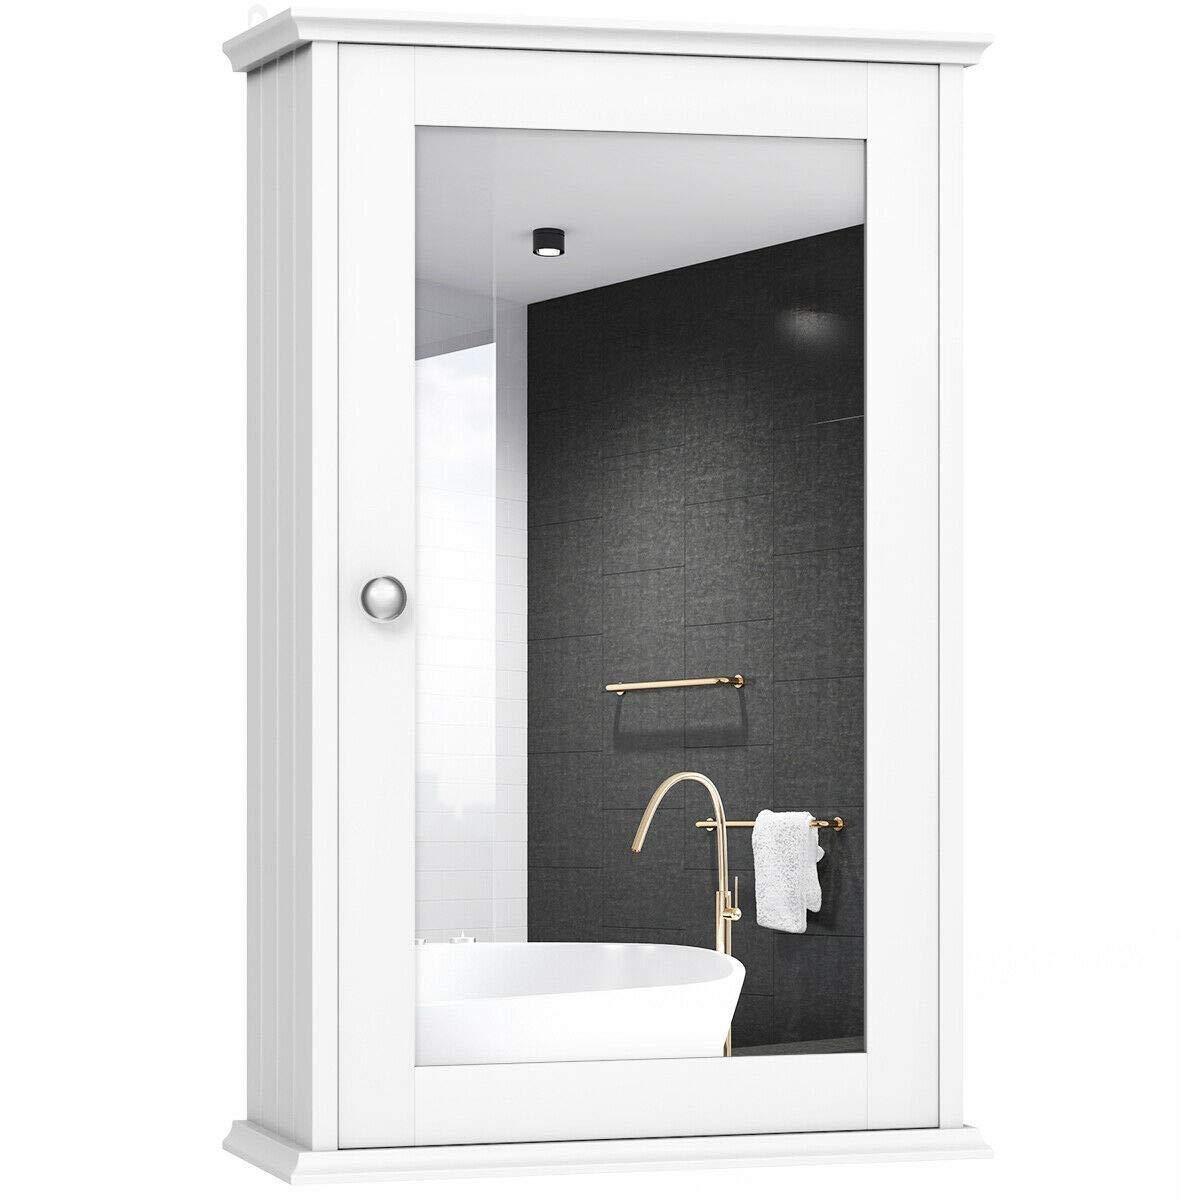 TANGKULA Mirrored Bathroom Cabinet Wall Mount Storage Cabinet Single Doors Medicine Cabinet White